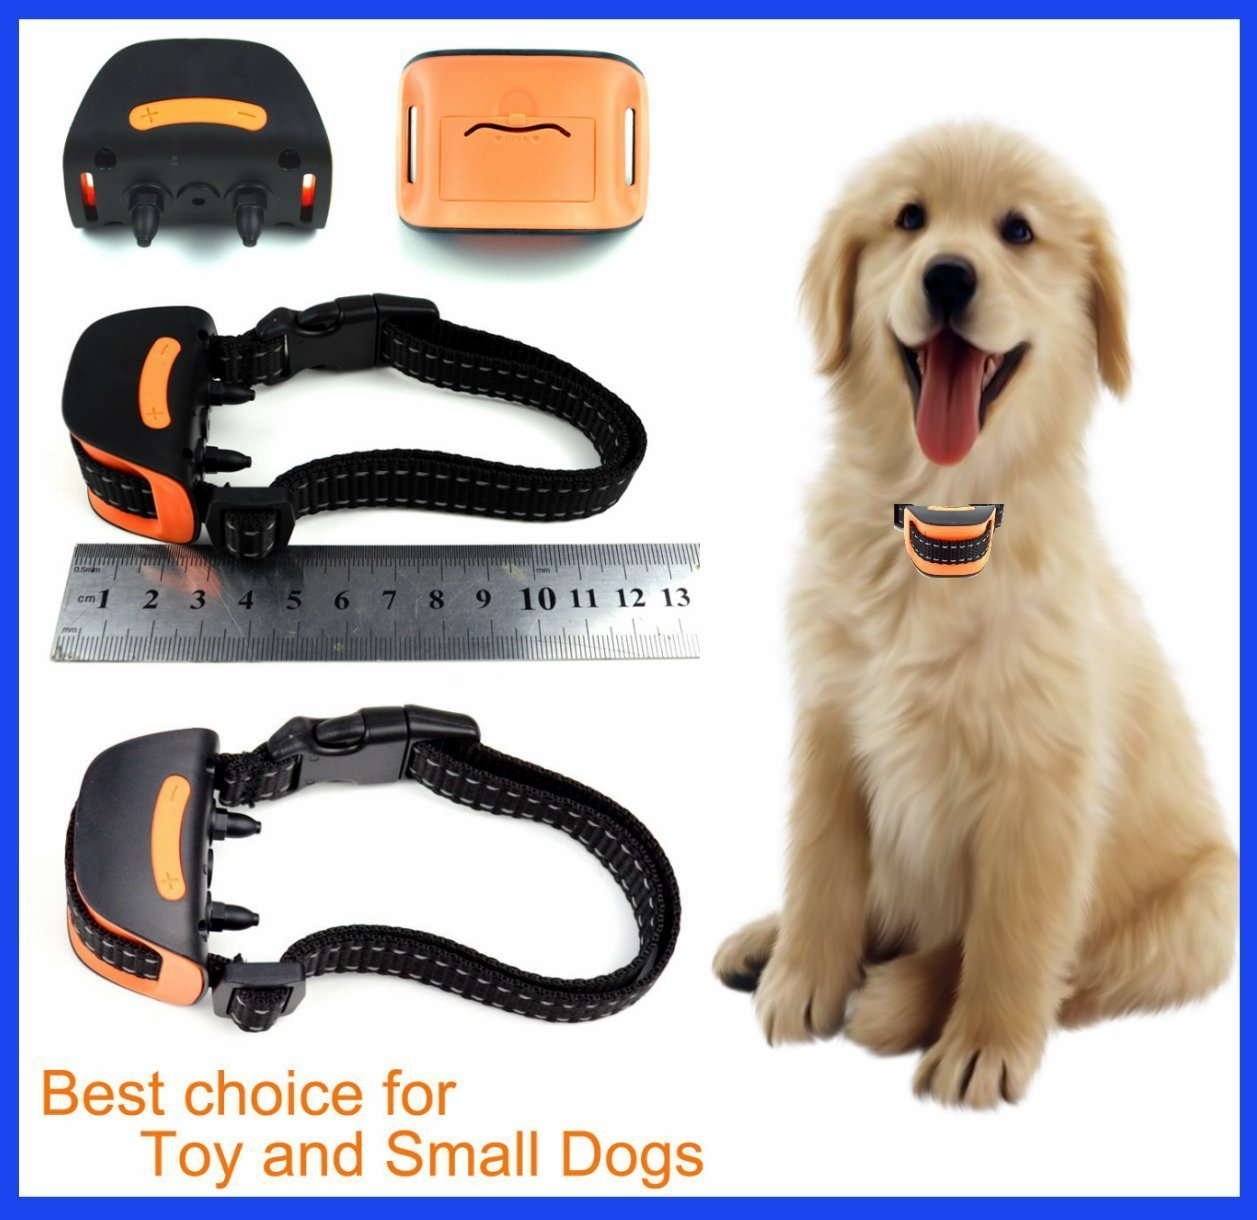 DogTech Mini 665V Vibration No Hurt Bark Dog Collar Extra Small Toy Dogs 4lbs to 14lbs Bark Training Solution 2019 Best Anti Bark Collar 100% Lifetime Product Warranty